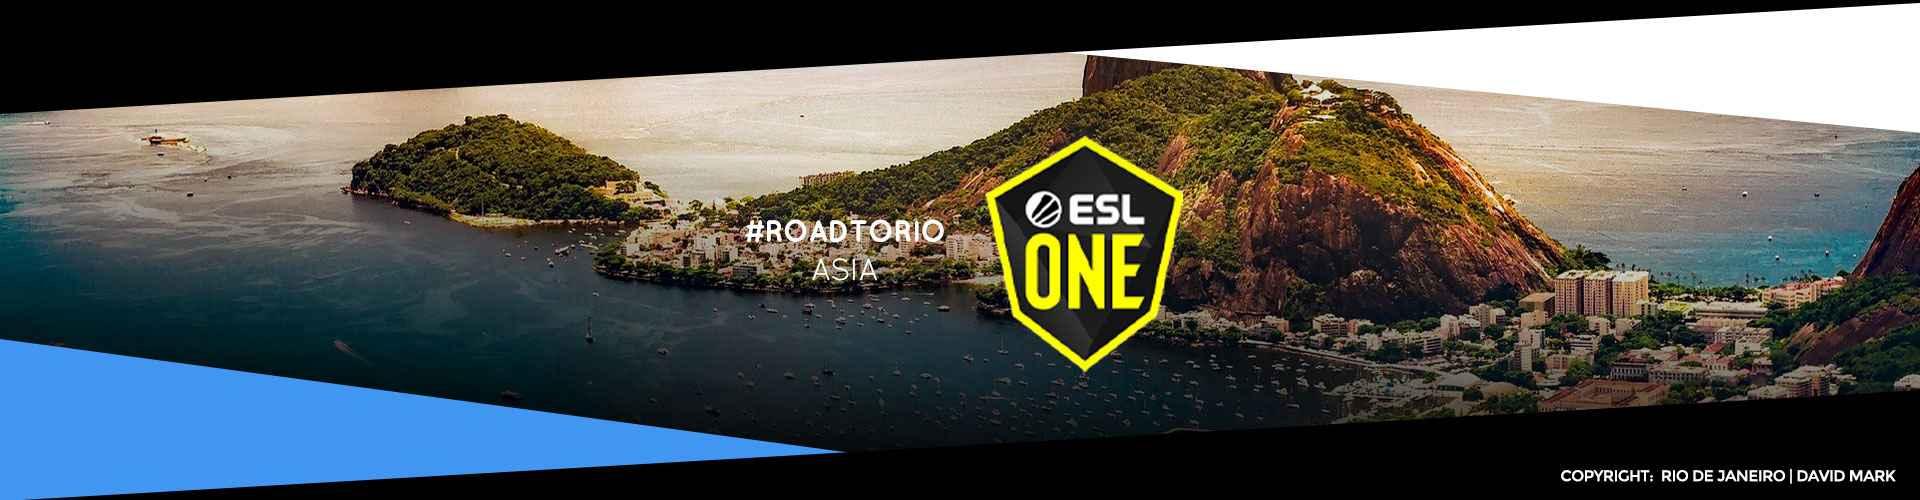 Eventsida för asiatiska ESL One: Road to Rio